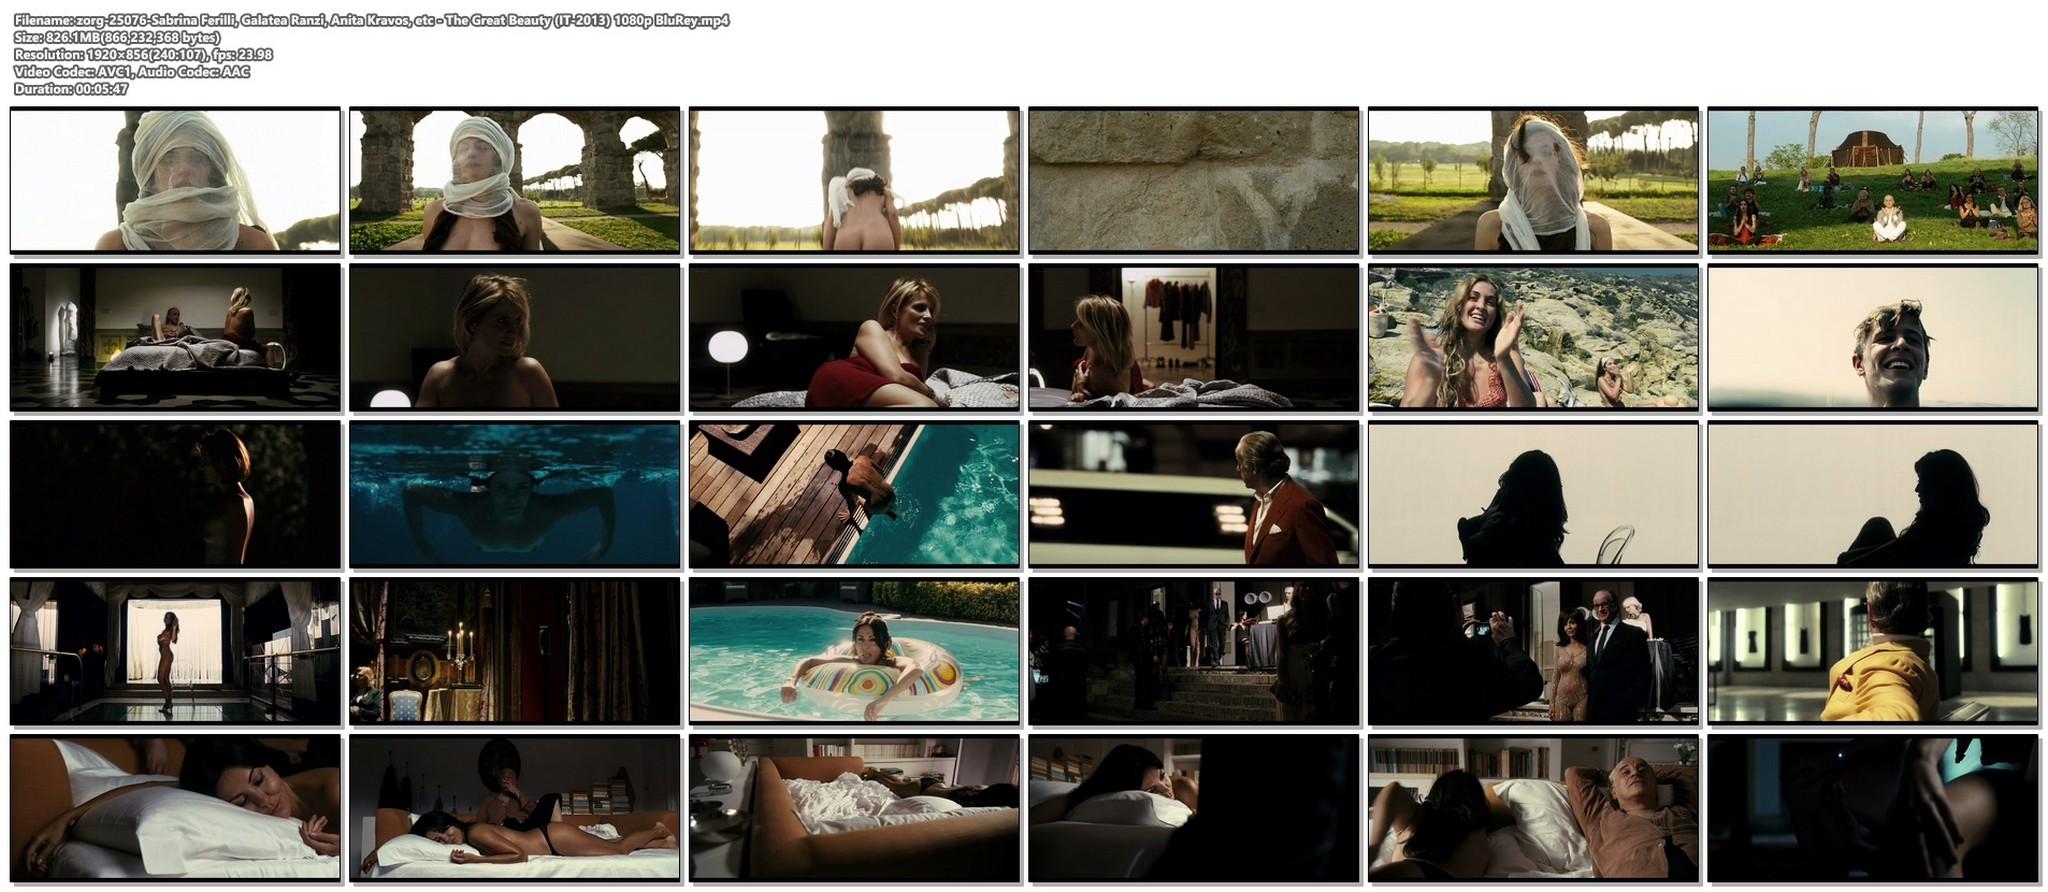 Sabrina Ferilli nude Anita Kravos full frontal Galatea Ranzi and others nude and sexy The Great Beauty IT 2013 1080p BluRey 20